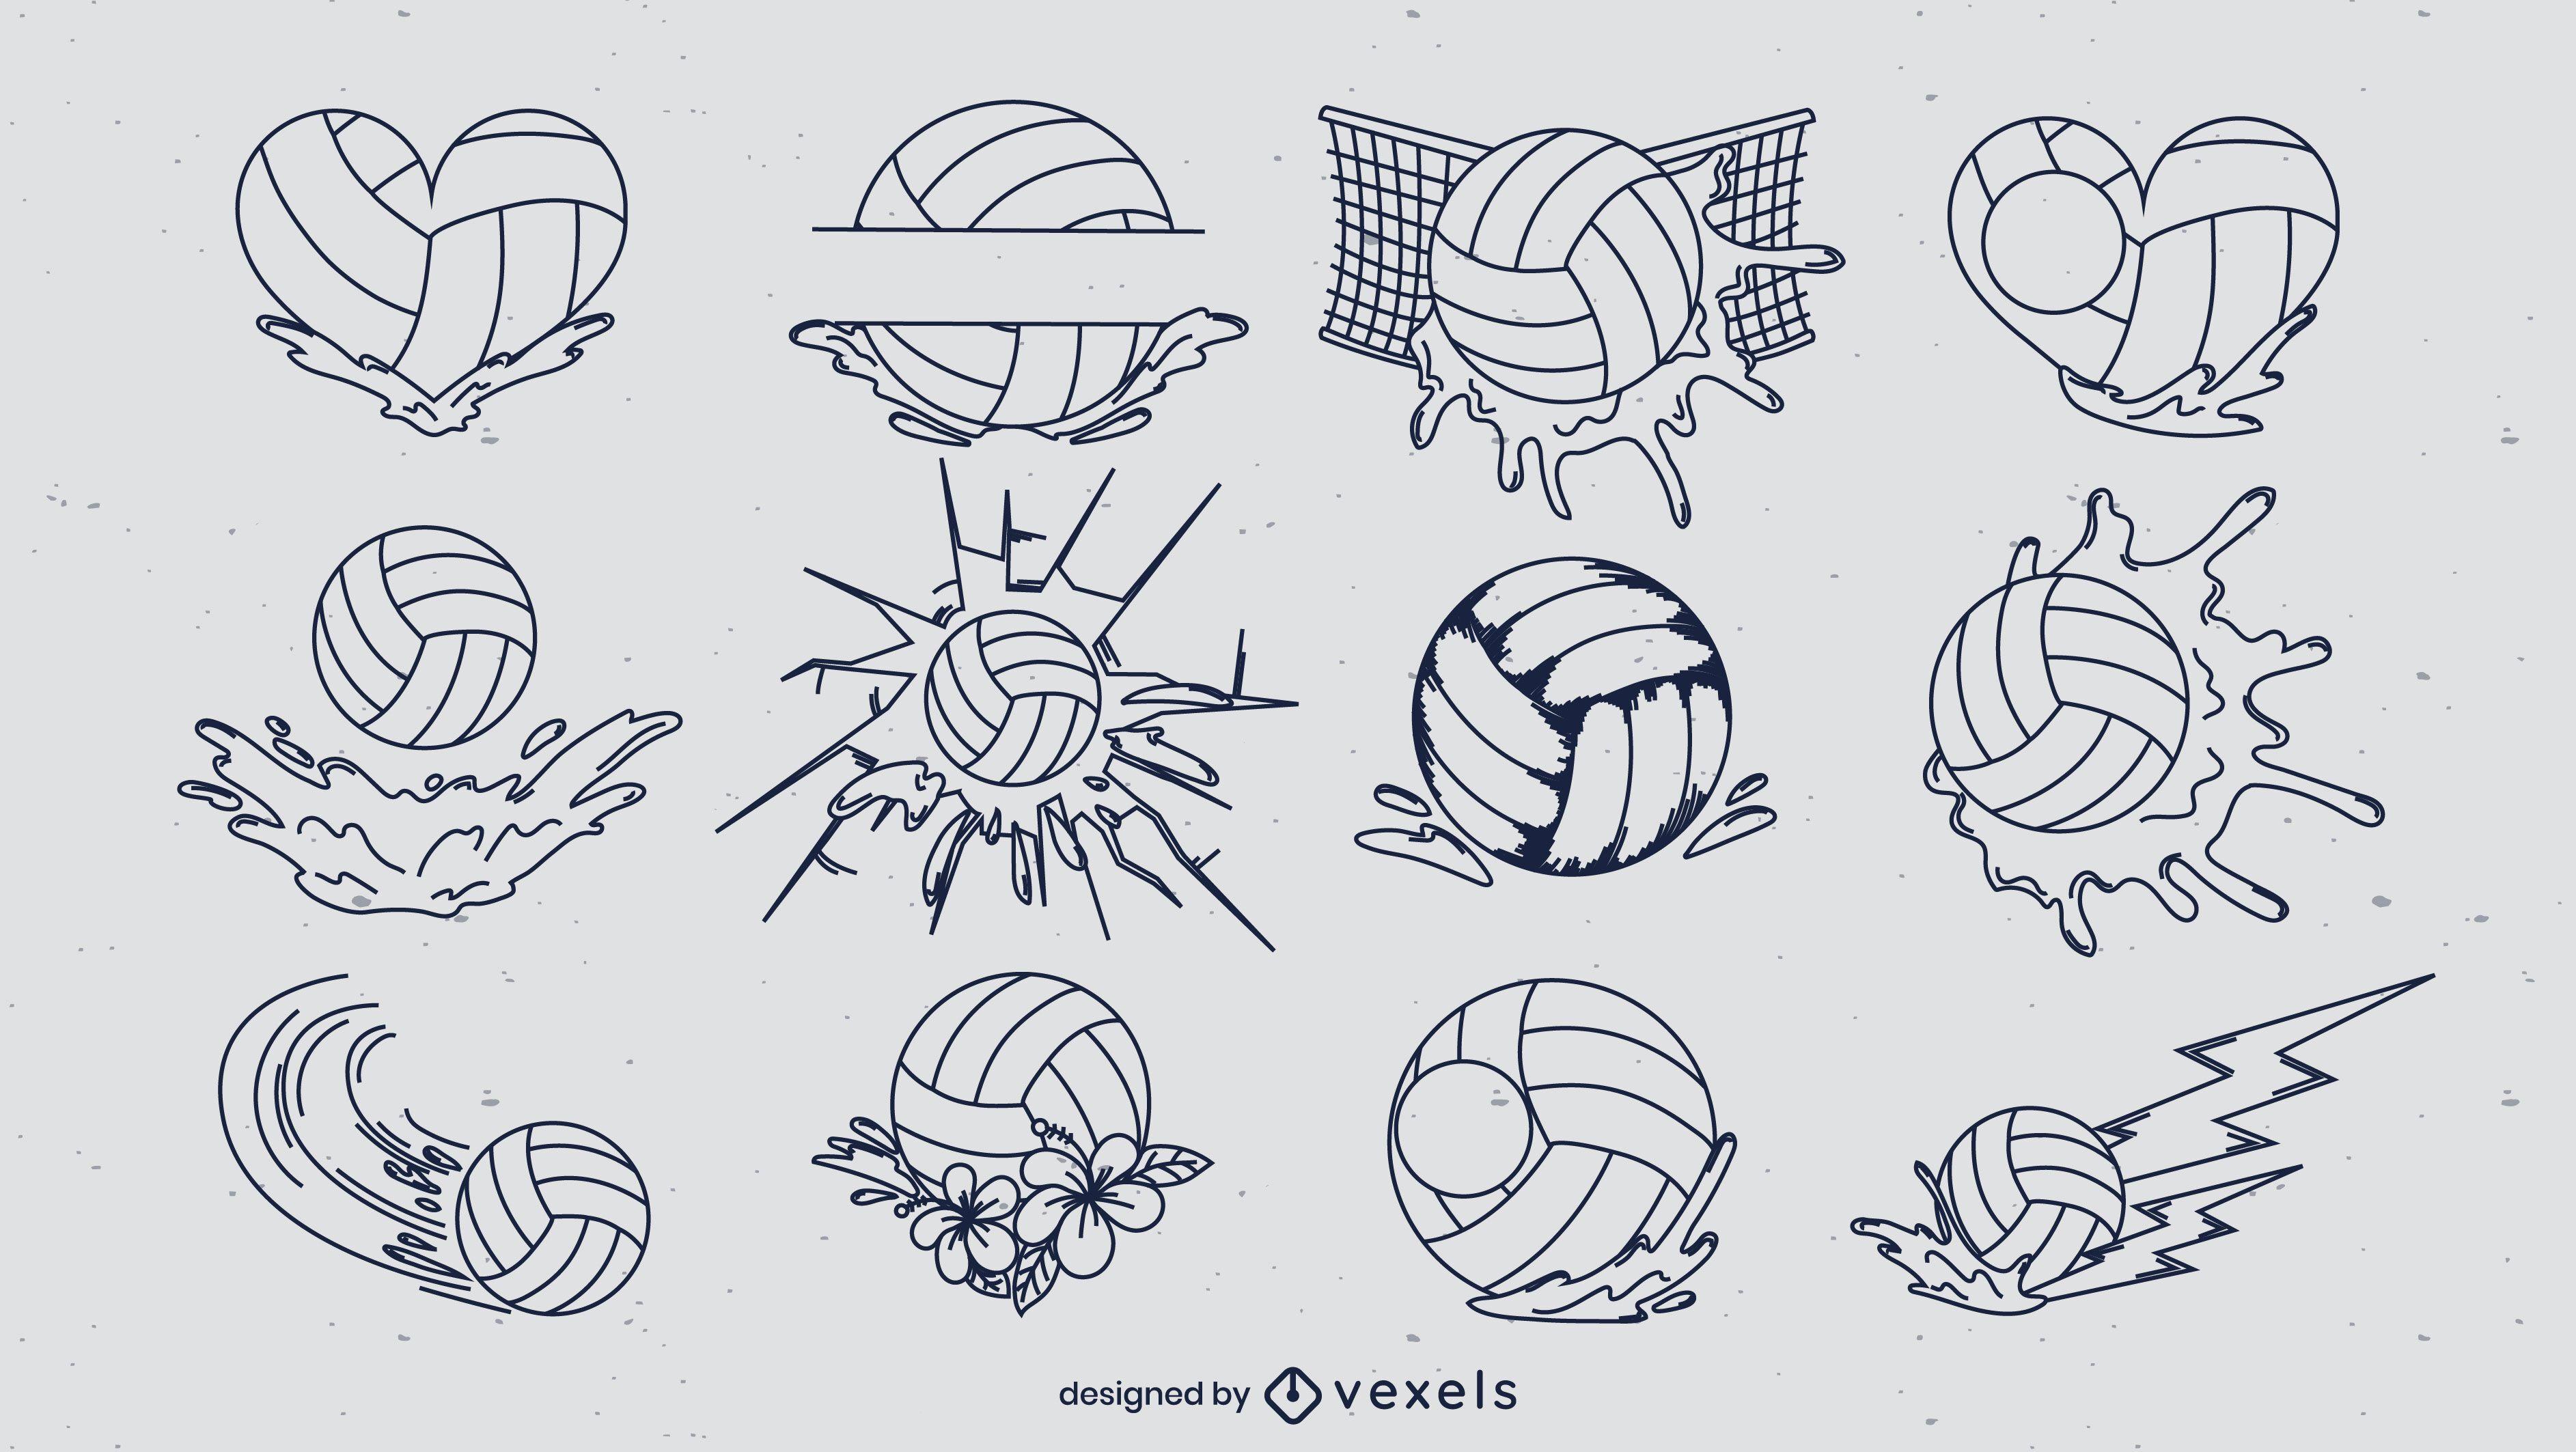 Conjunto de elementos de arte de linha de bola de pólo aquático